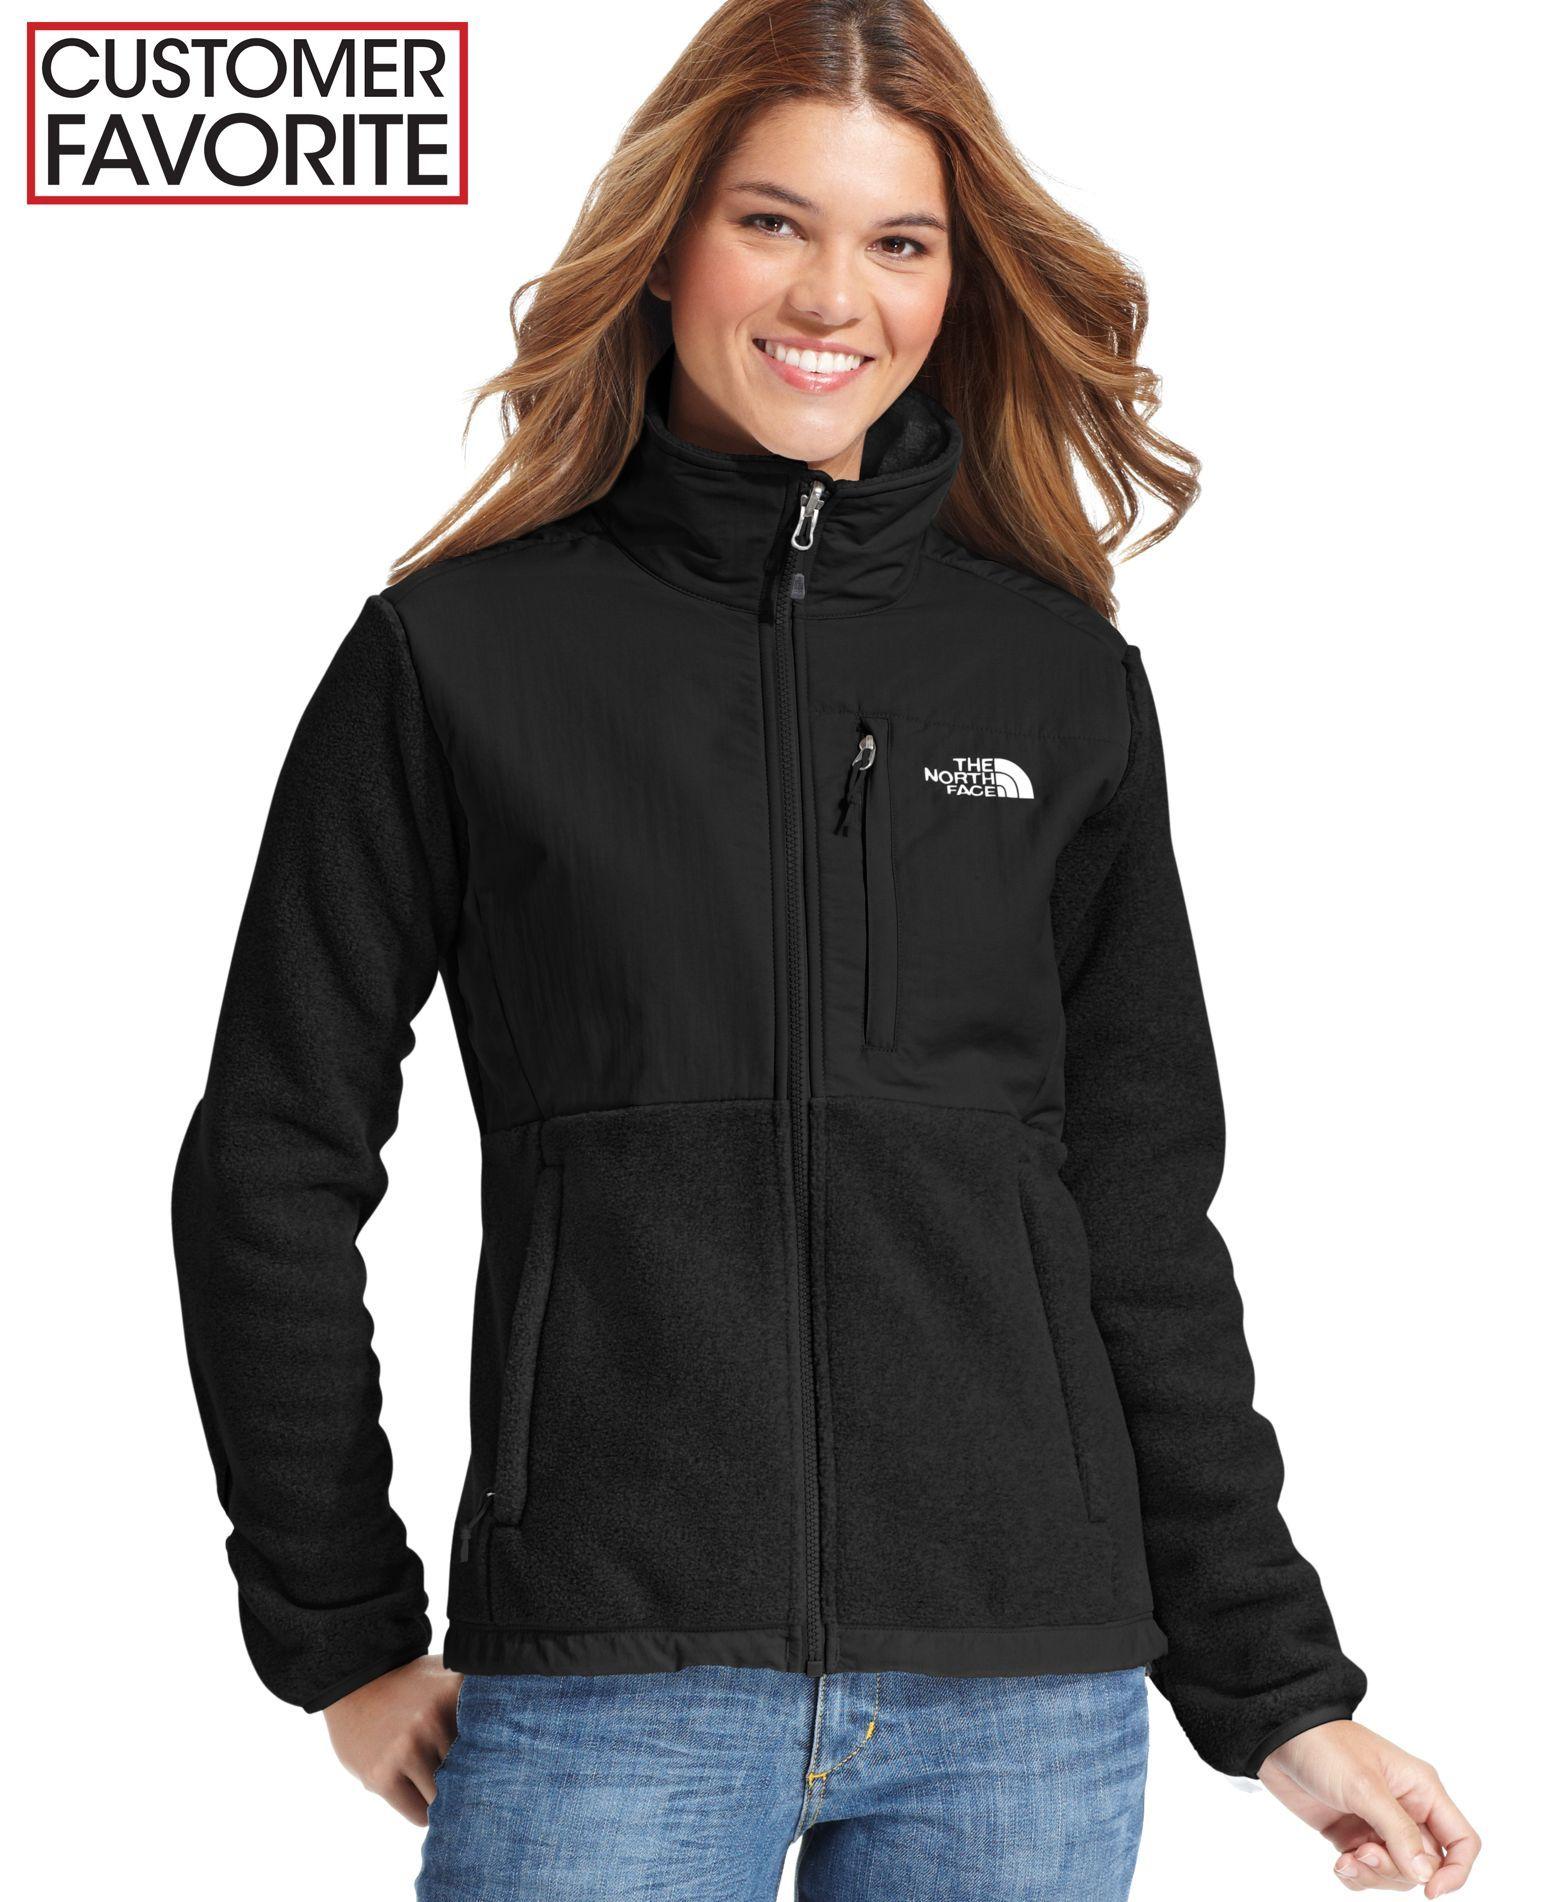 87e5d4581 The North Face Denali Fleece Jacket - Jackets & Blazers - Women ...